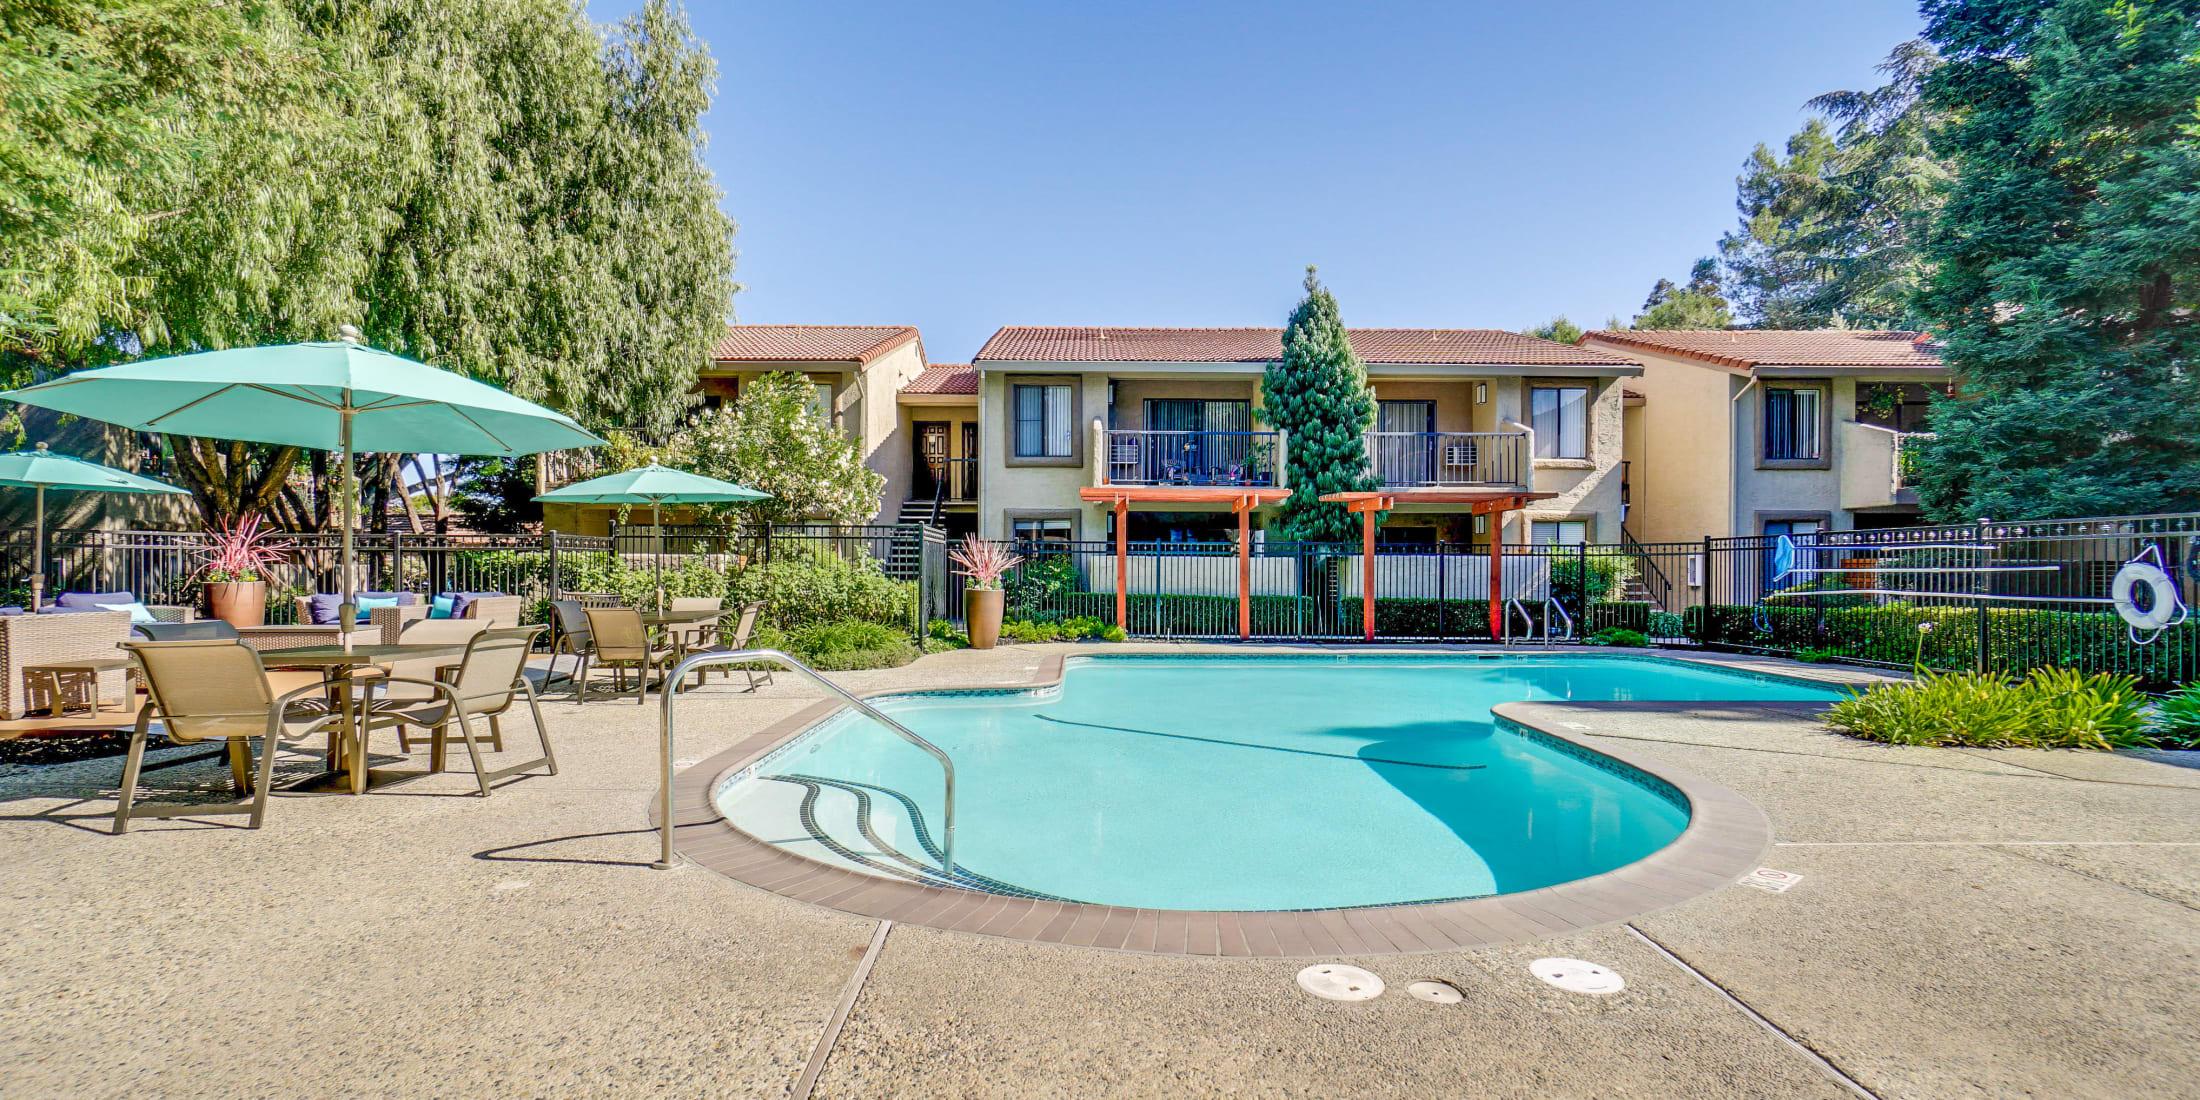 Photos of apartments in San Jose, CA